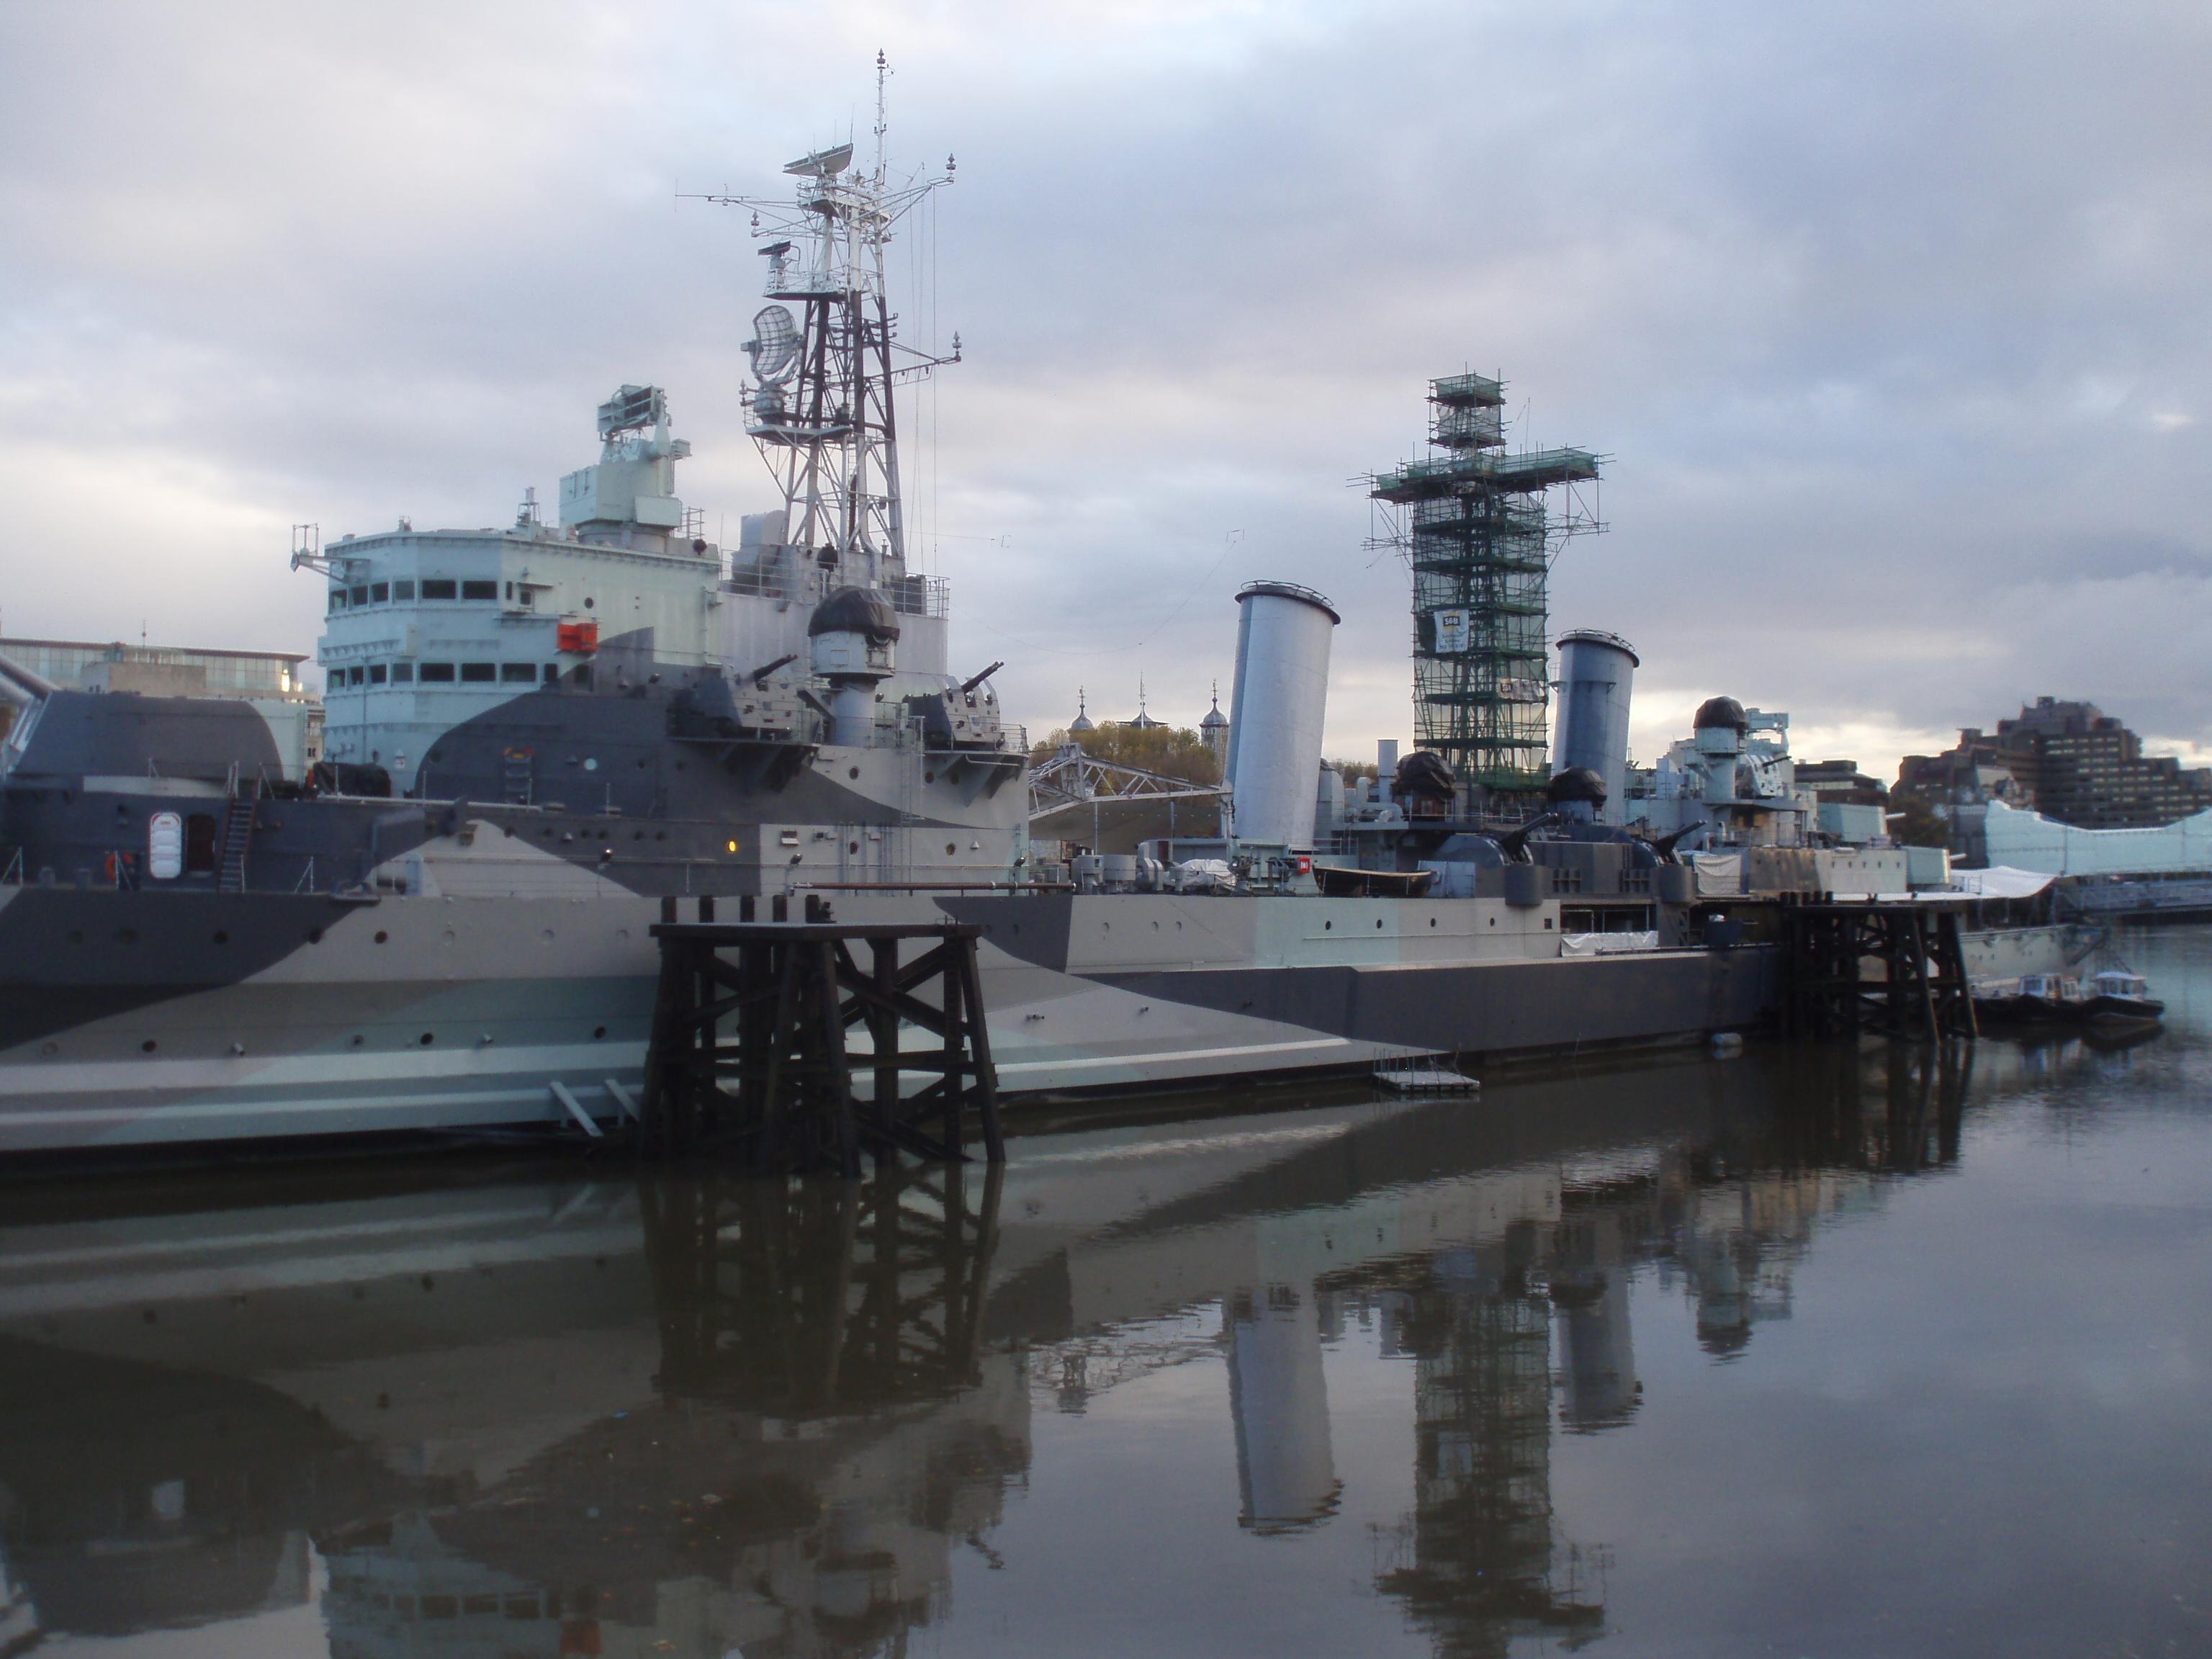 Panserskibe og artilleriskibe 1860-1960